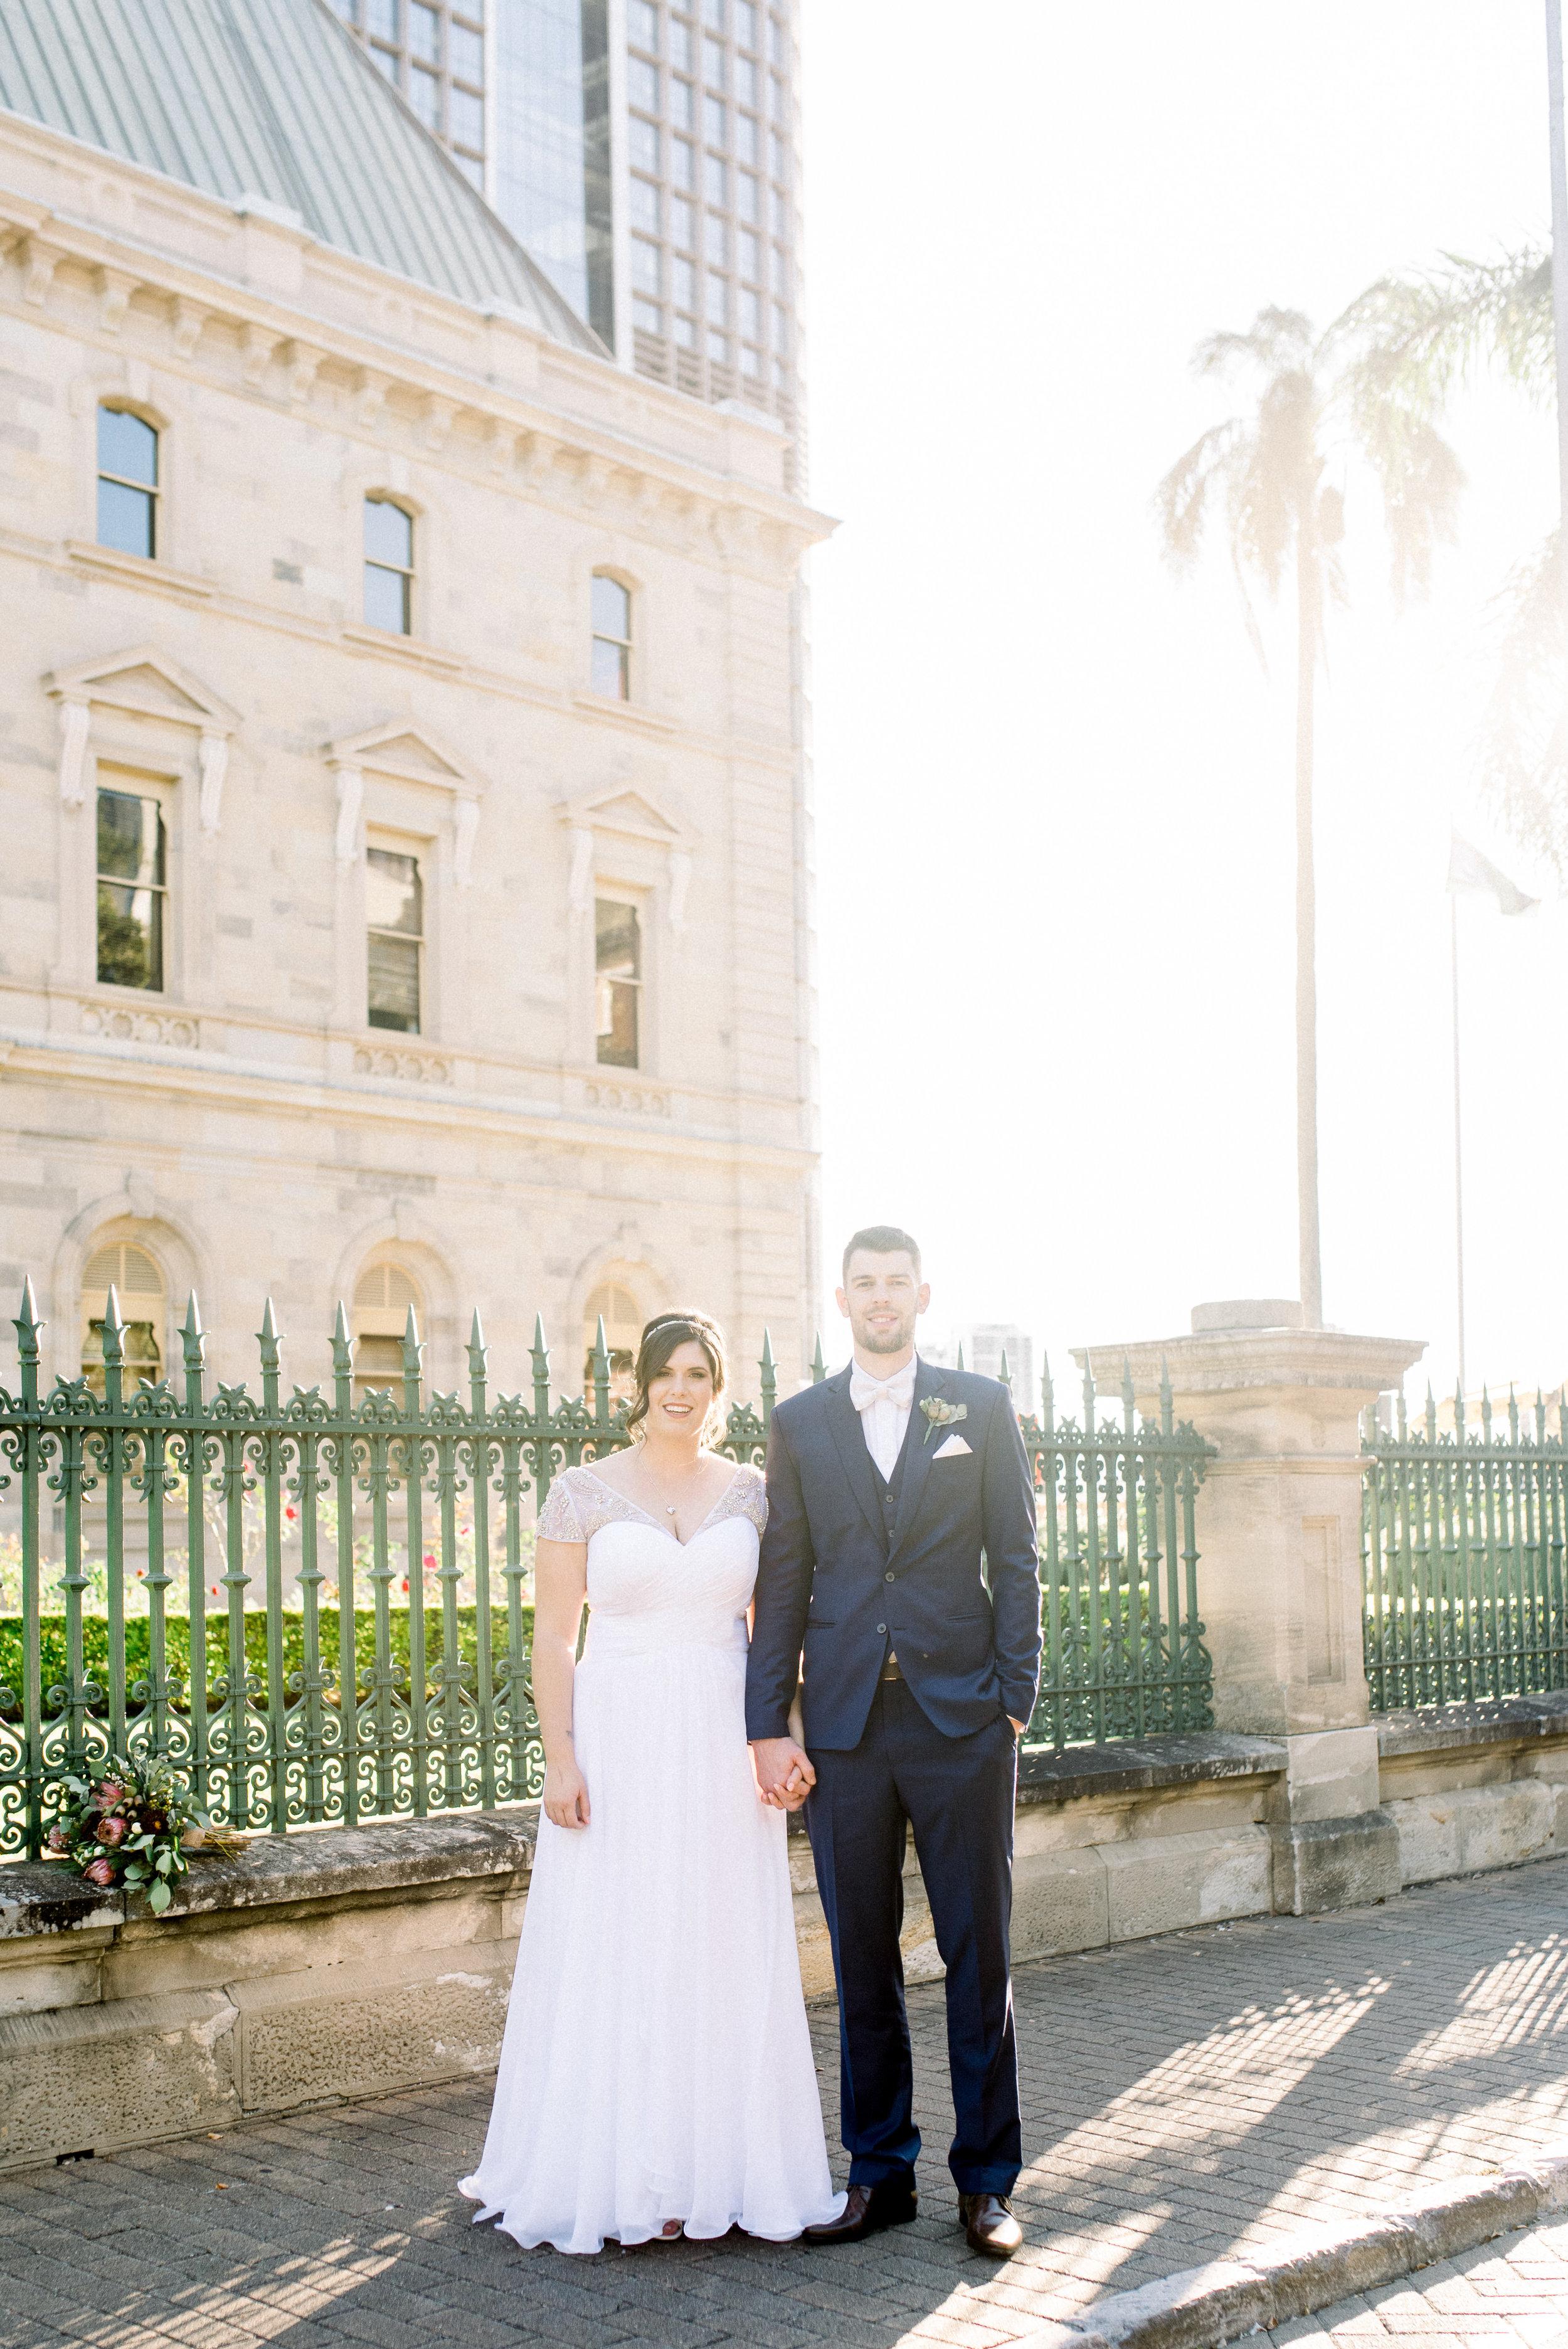 brisbane-city-wedding-photography-film-light-loft-westend-1-12.jpg